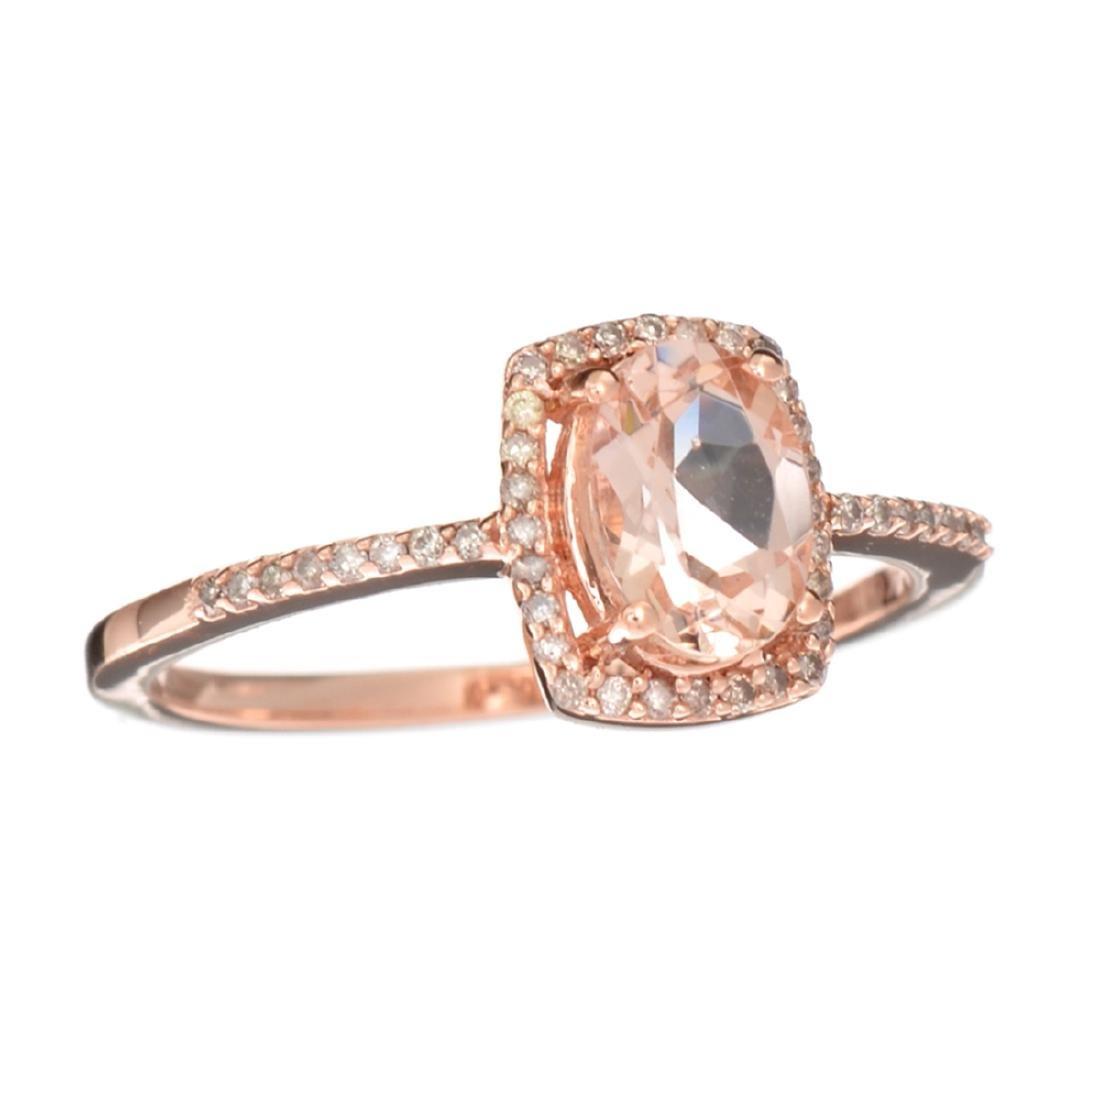 Designer Sebastian 14KT Rose Gold, Oval Cut Morganite